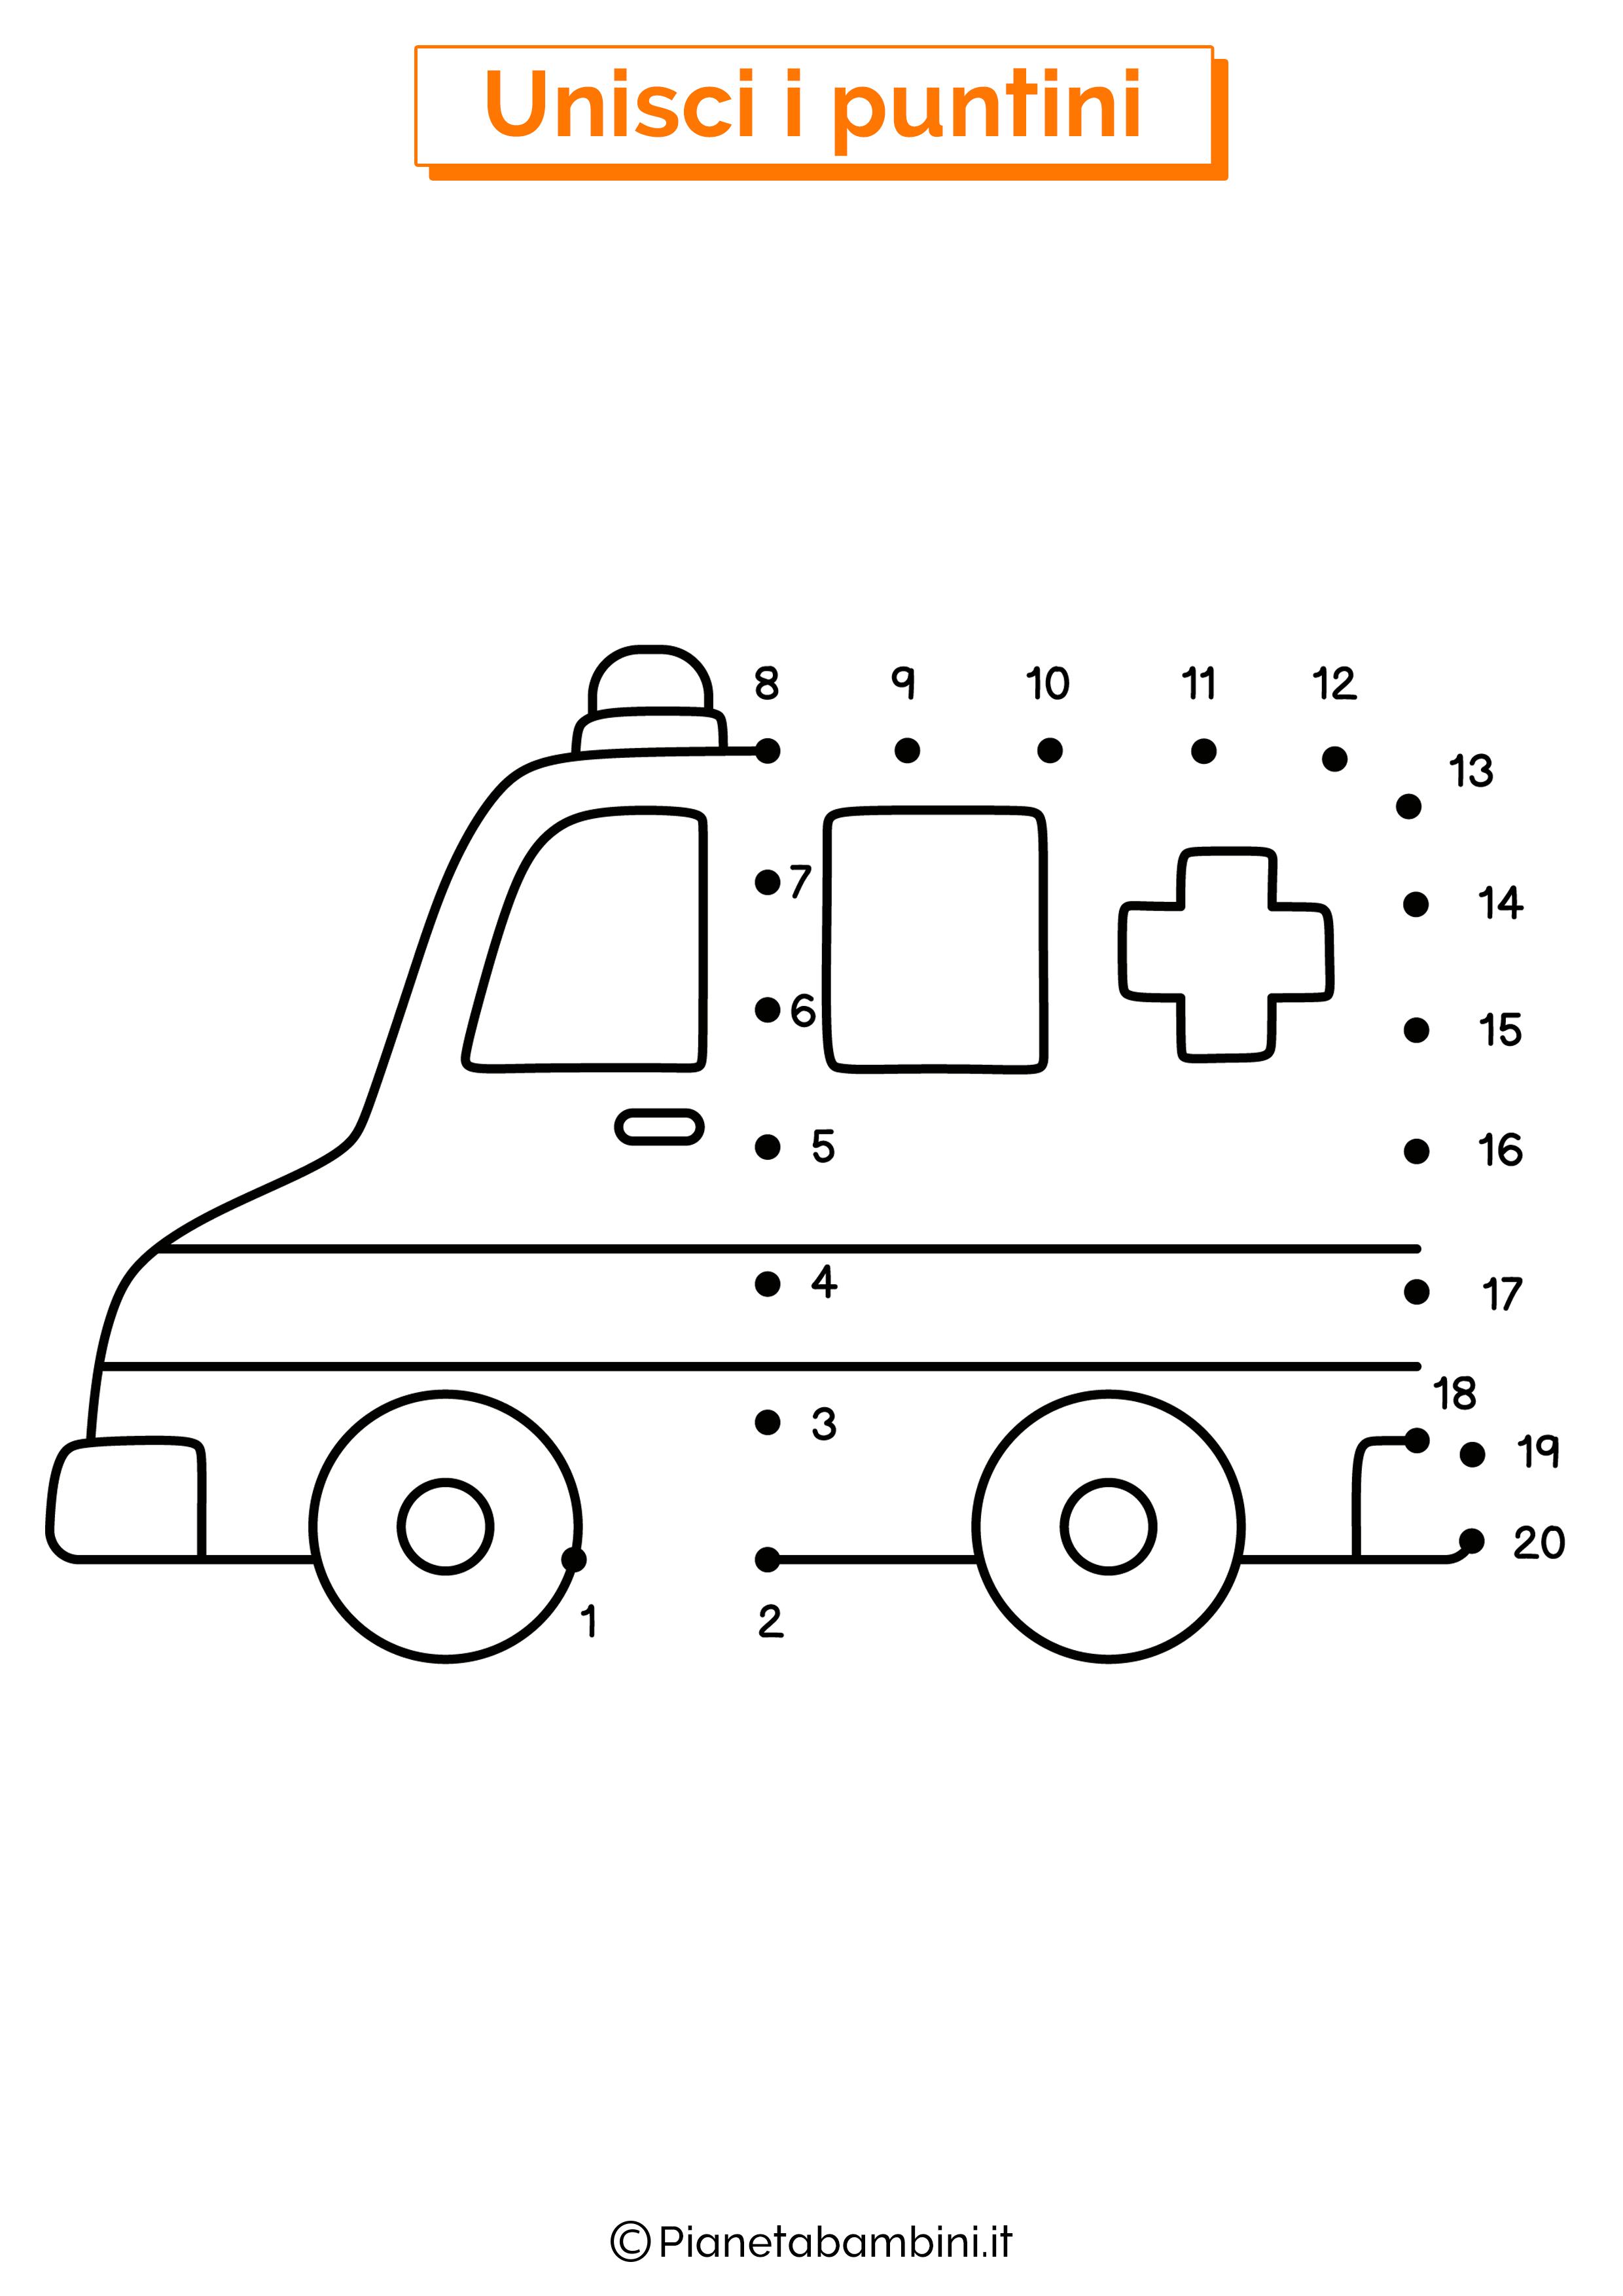 Disegno unisci i puntini ambulanza